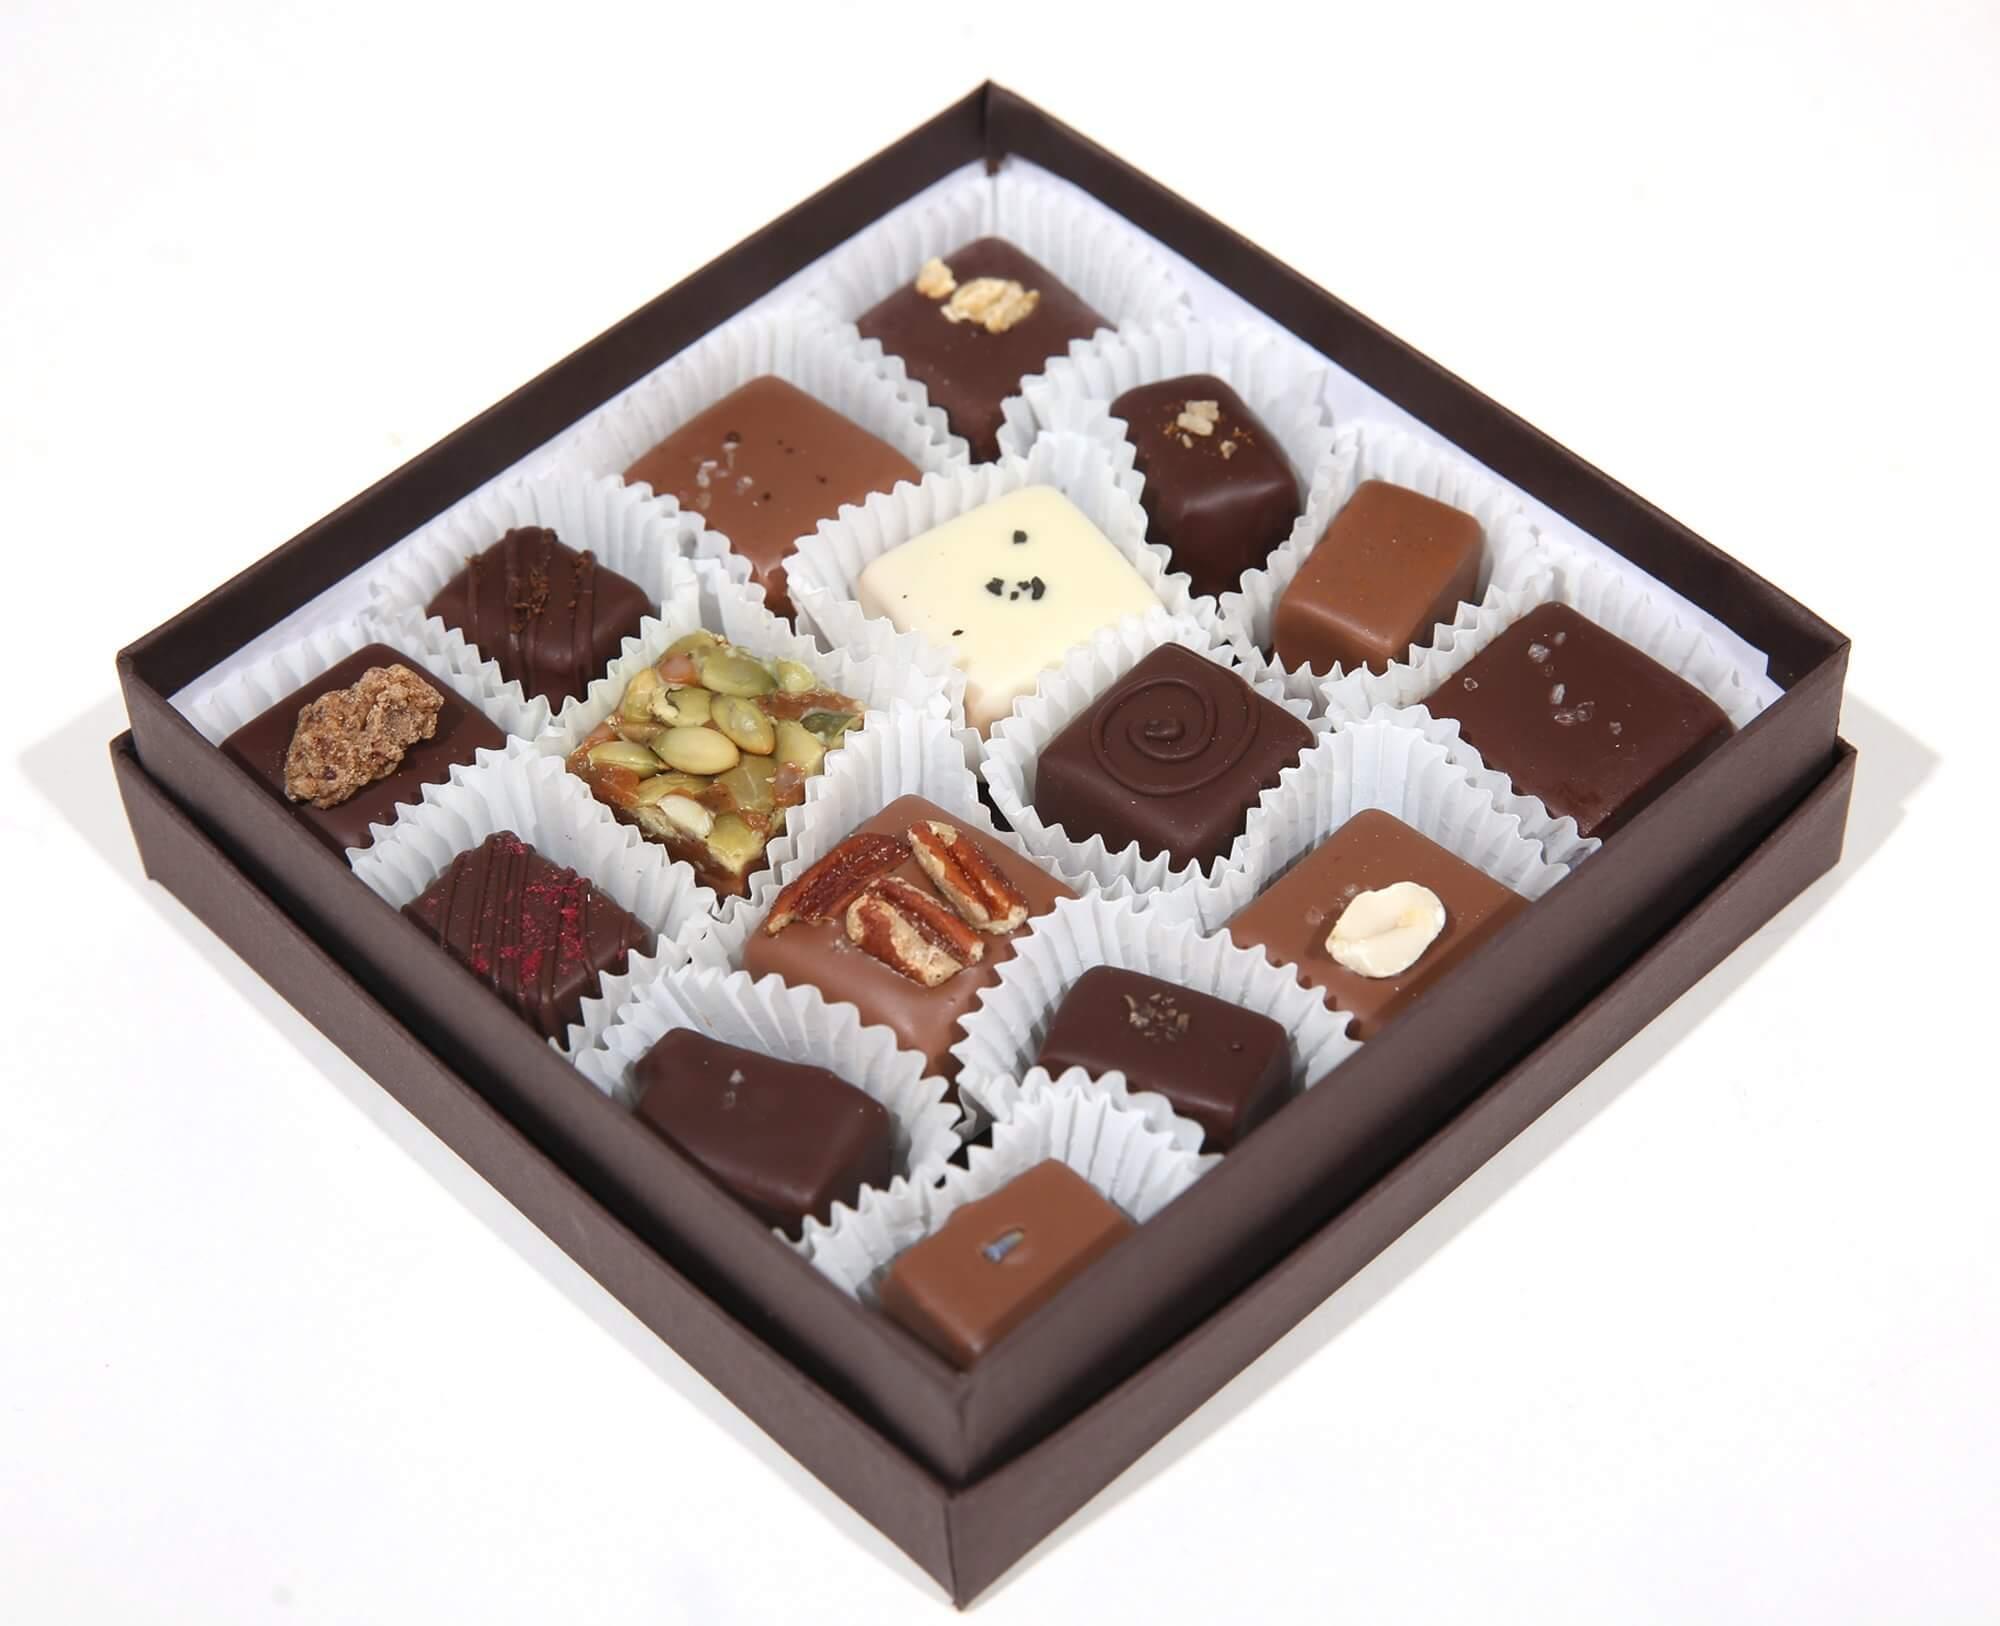 Kakao truffles